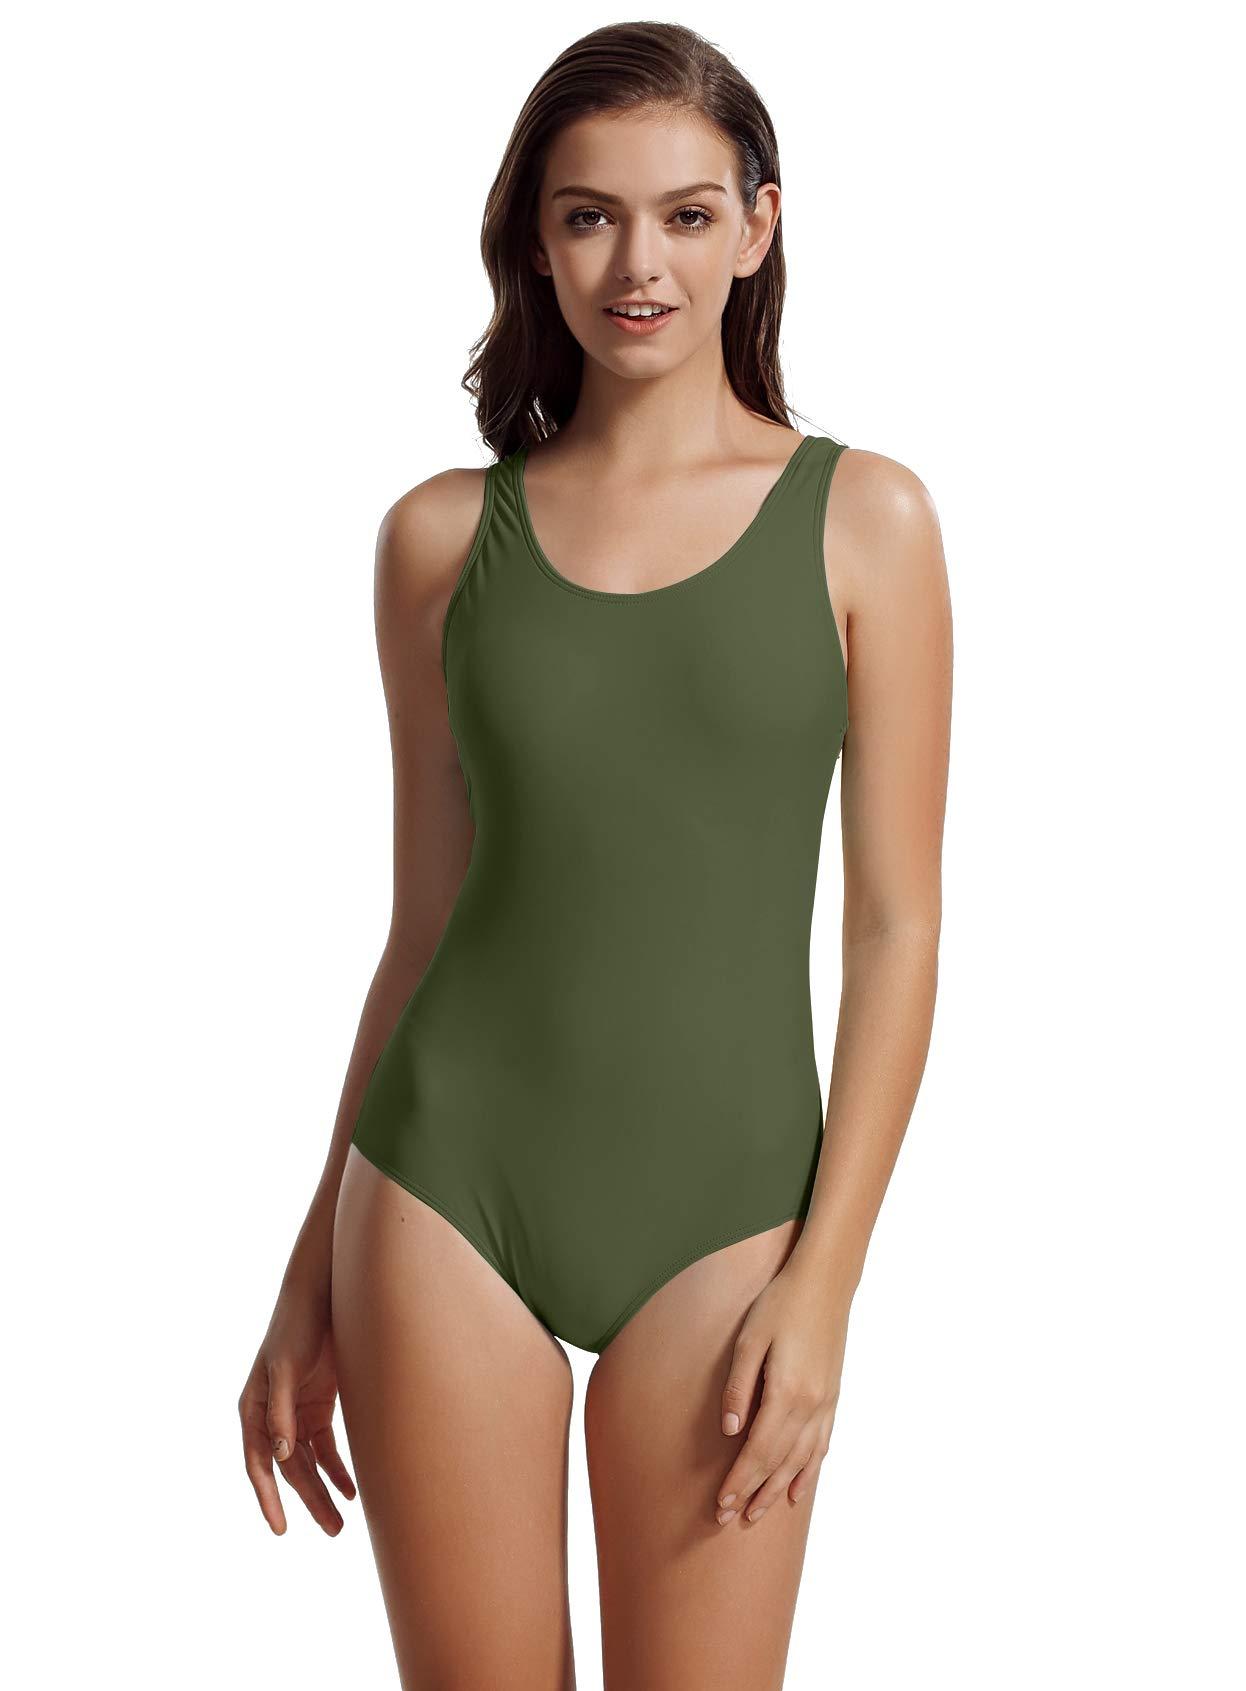 087ad0935 zeraca Women s Sport Racerback One Piece Swimsuit Swimwear product image